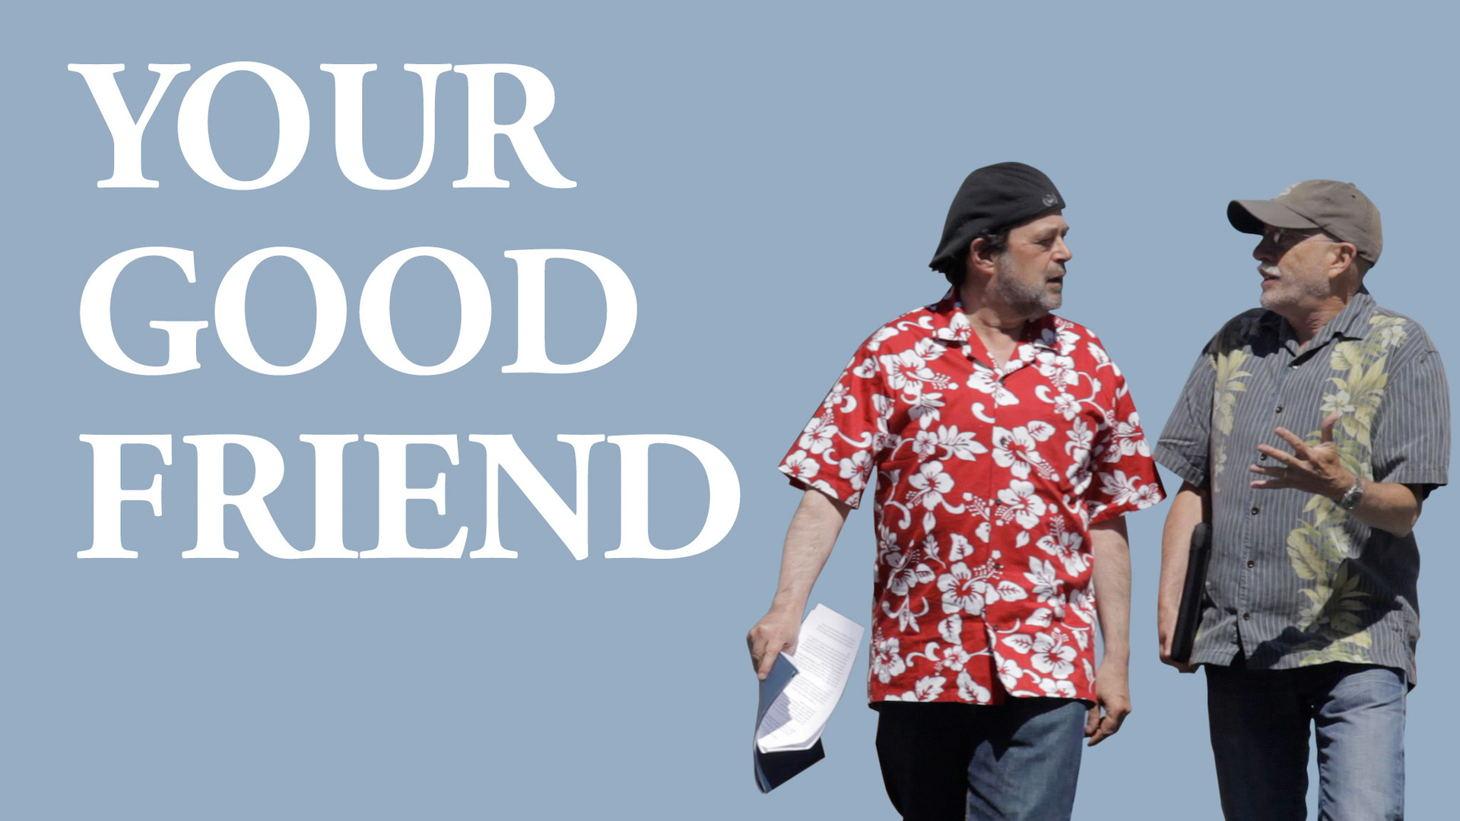 Your Good Friend